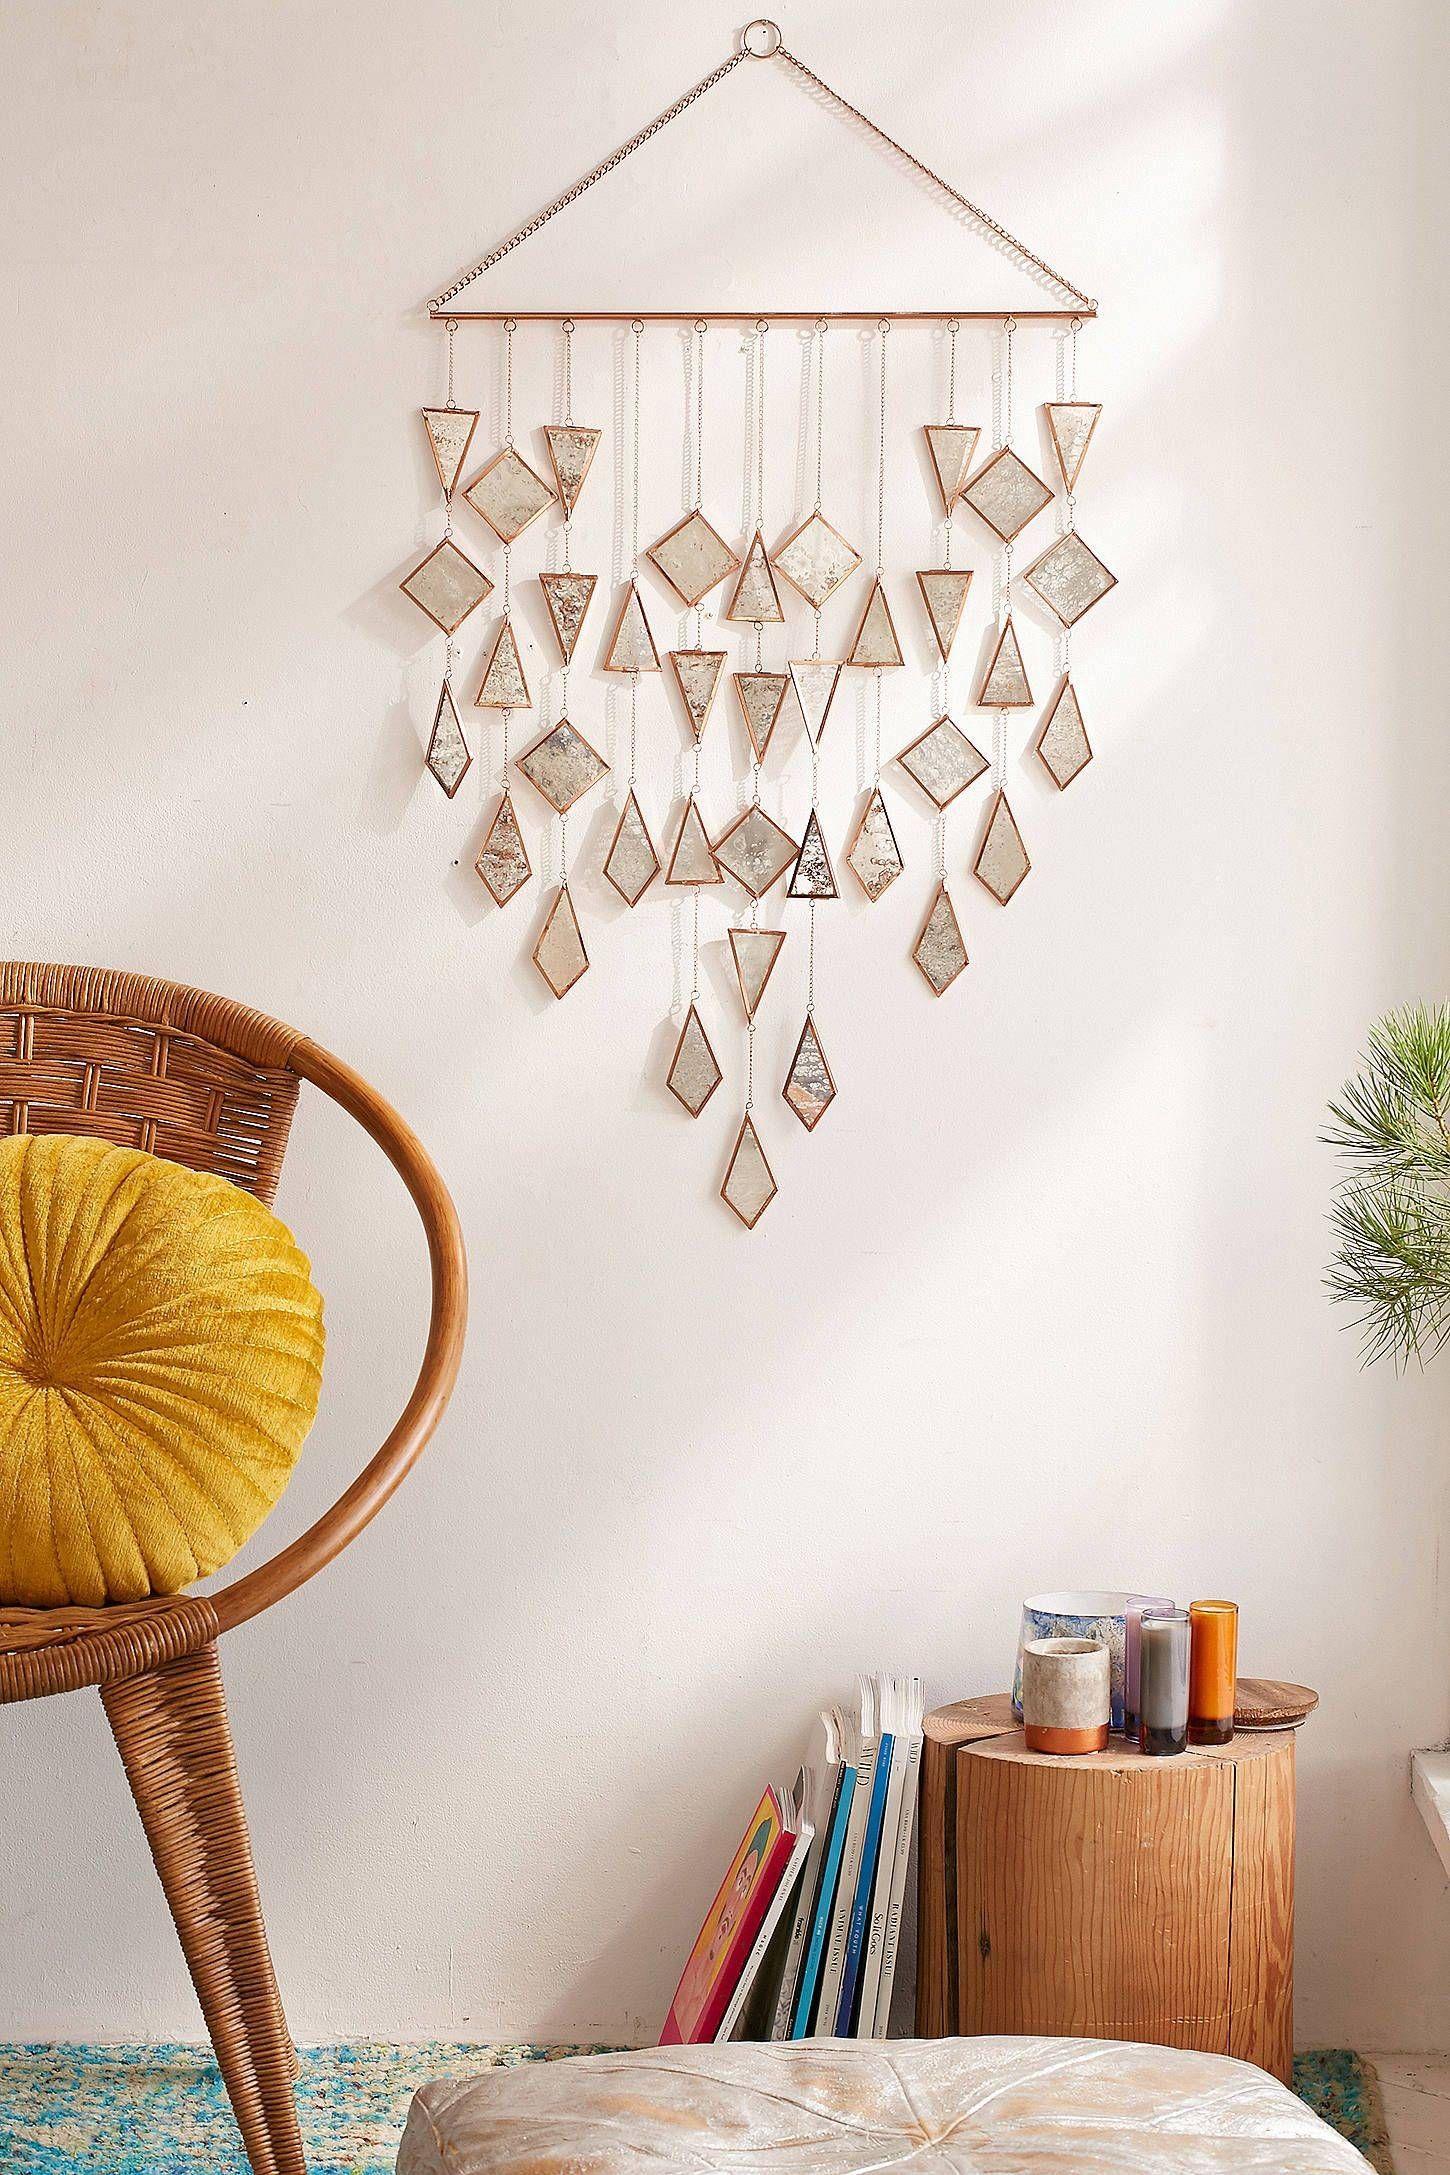 Hanging Decorations For Home Homedesign Homedecor